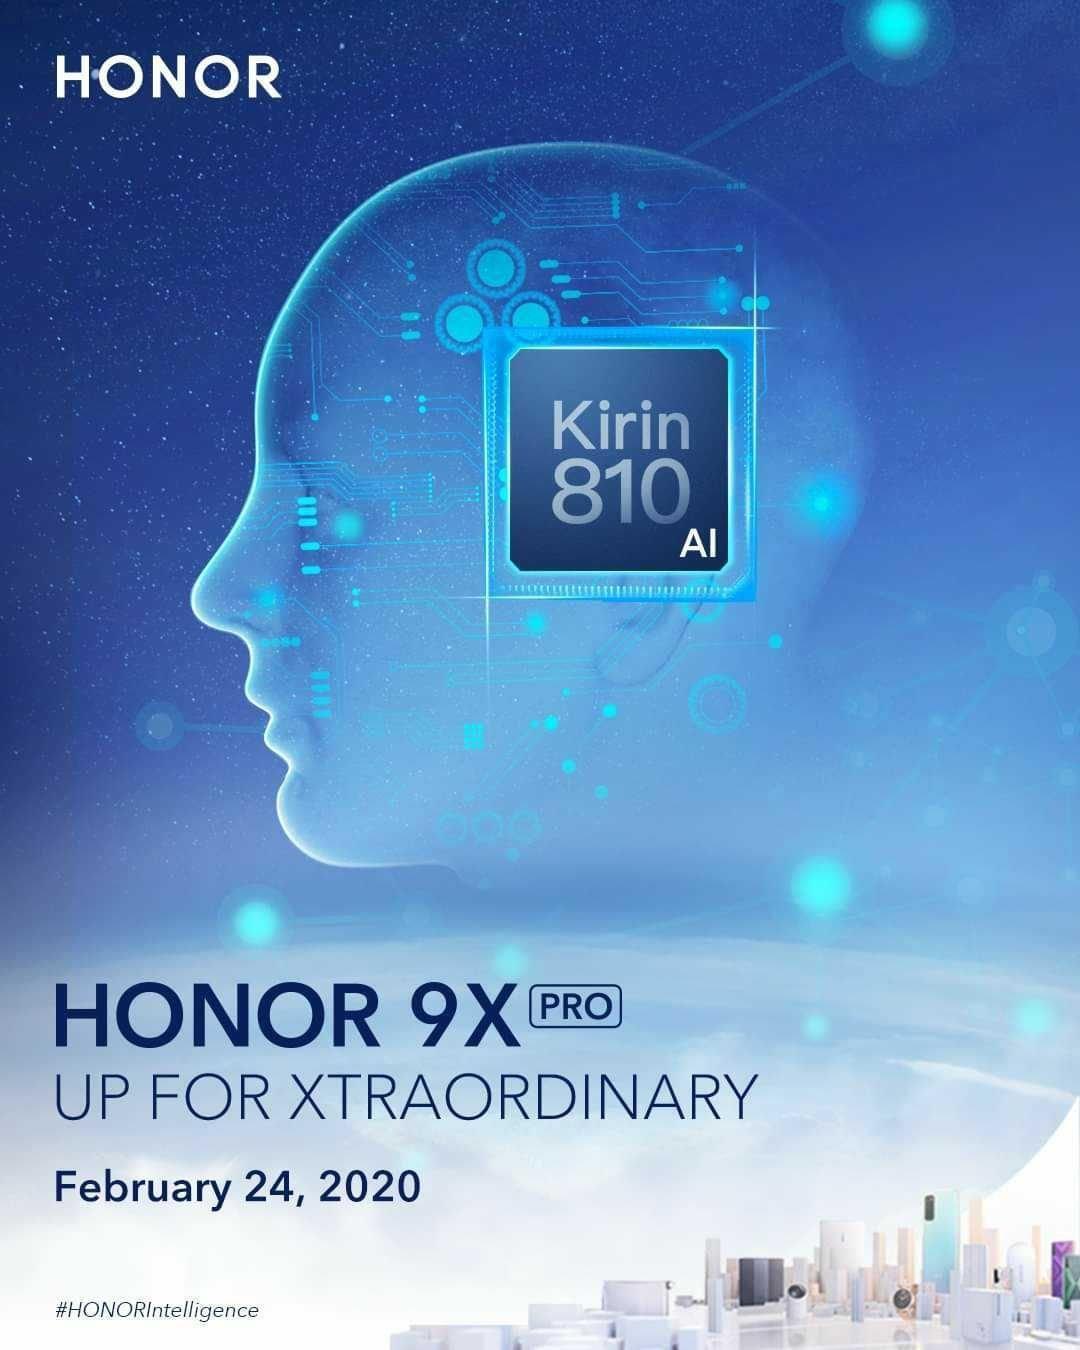 honor-9x-pro-2 Honor 9X Pro станет первым смартфоном с Huawei Mobile Services